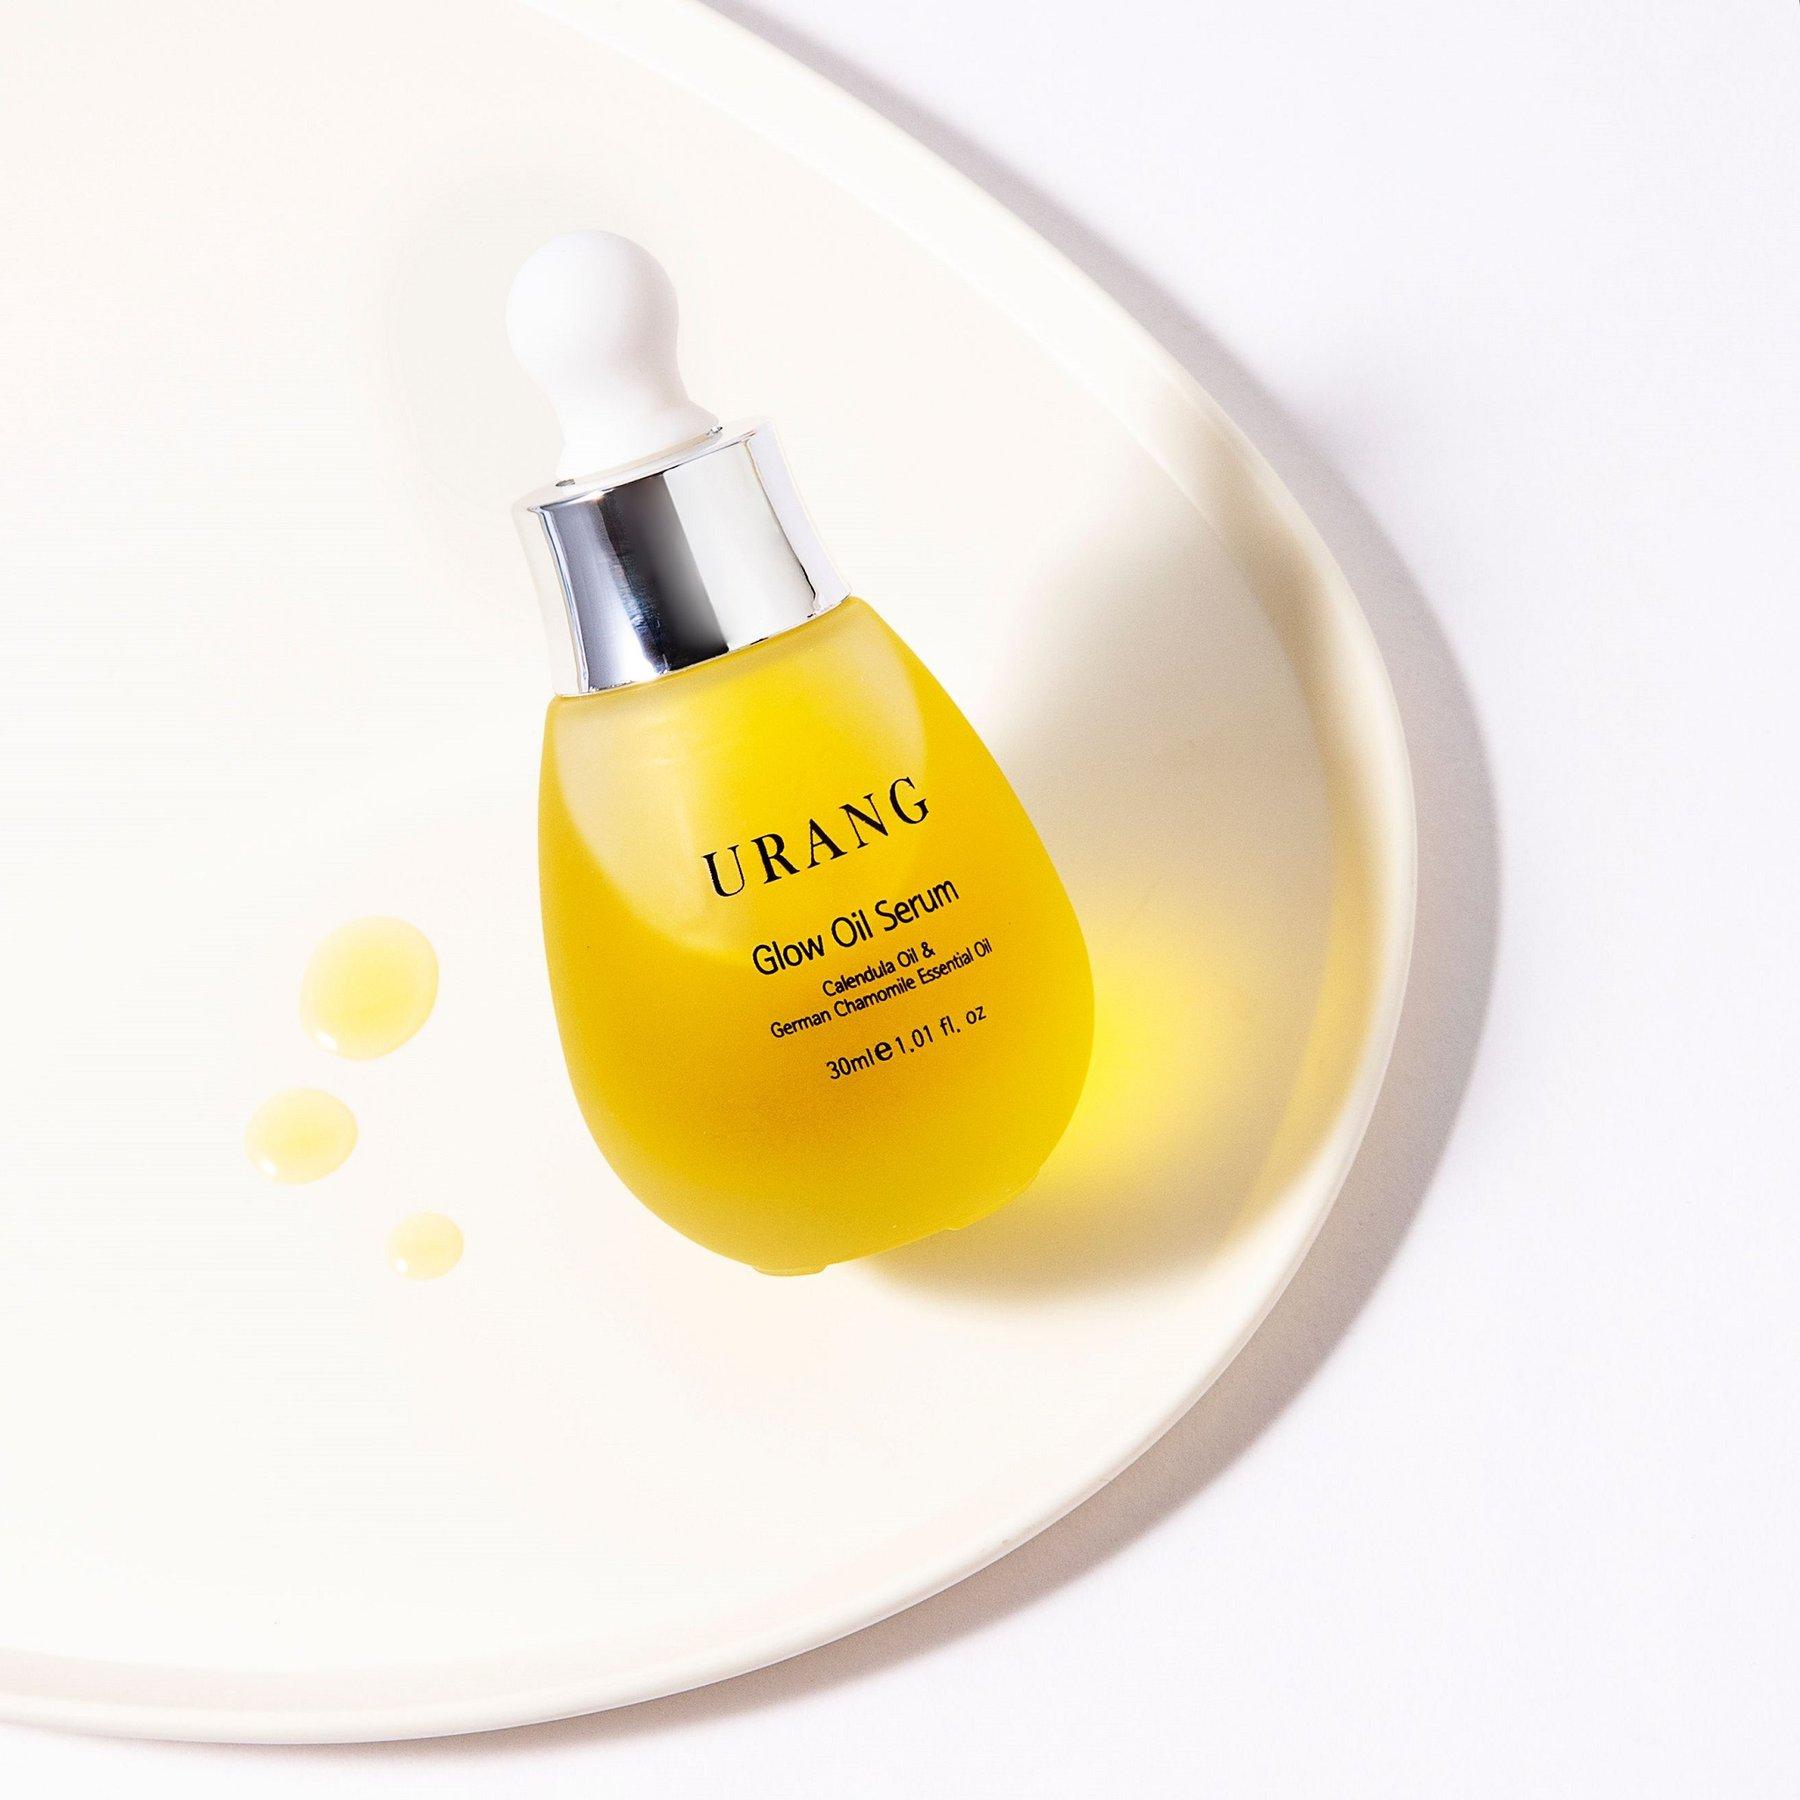 urang-glow-oil-serum-avis-revue-cosmetiques-coreens-bio